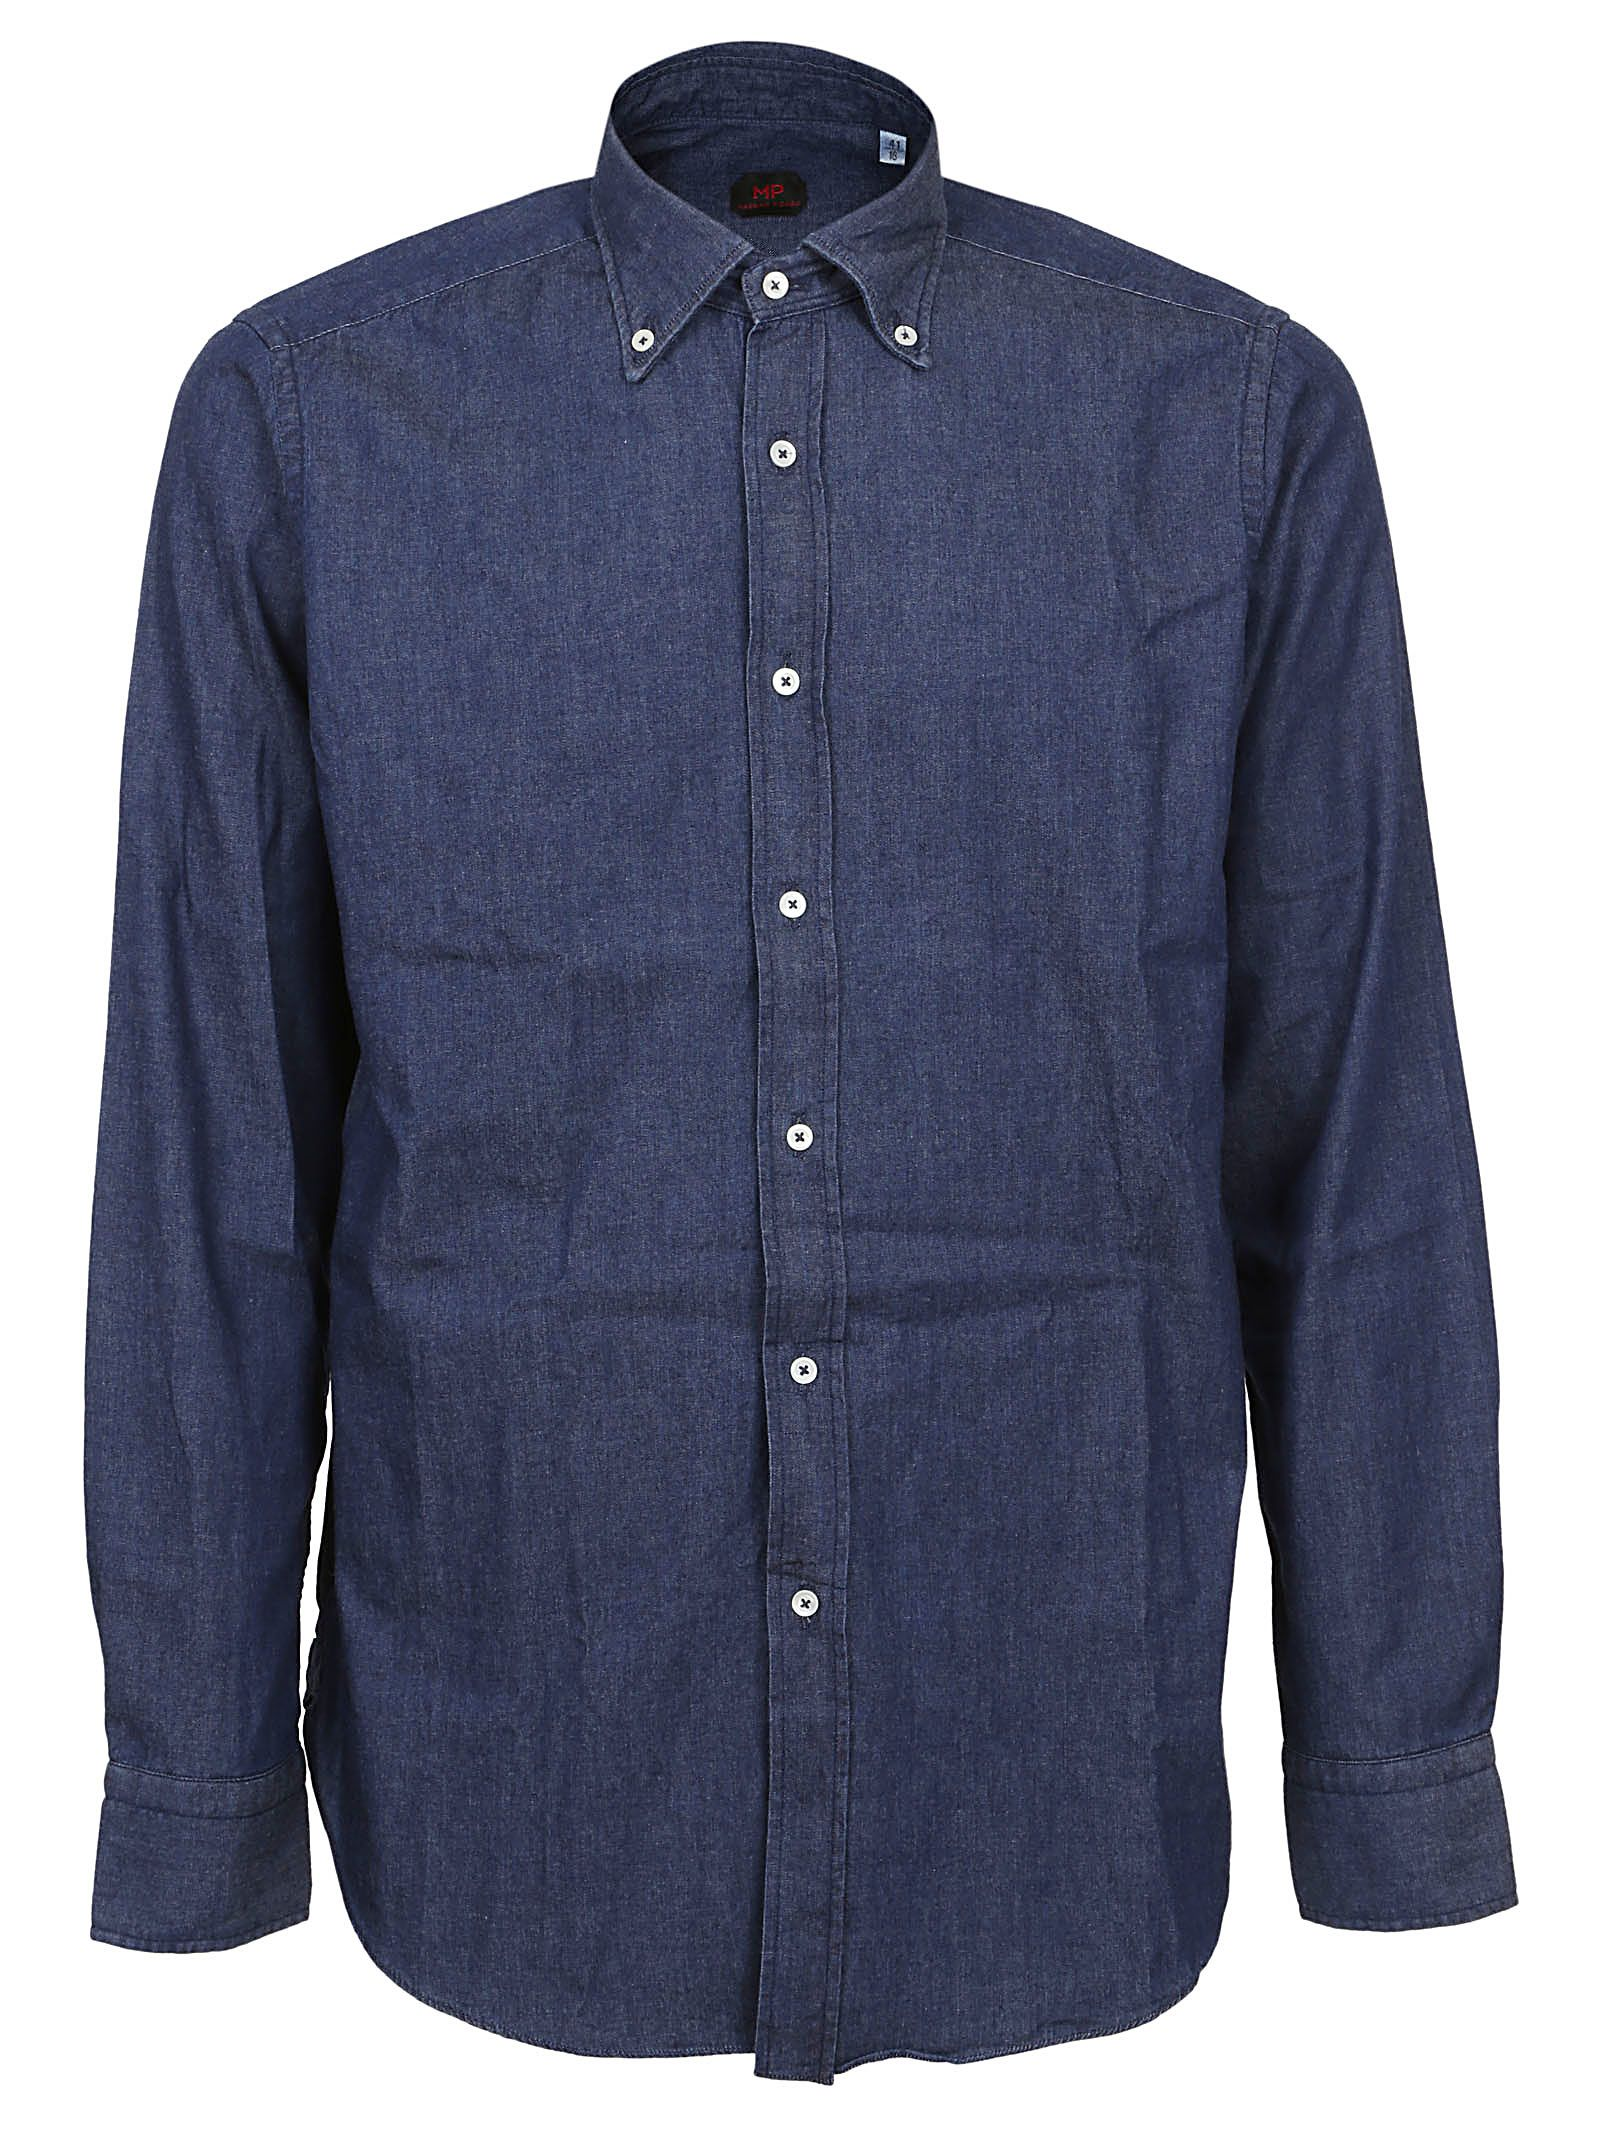 MASSIMO PIOMBO Button Down Shirt in Denim Scuro